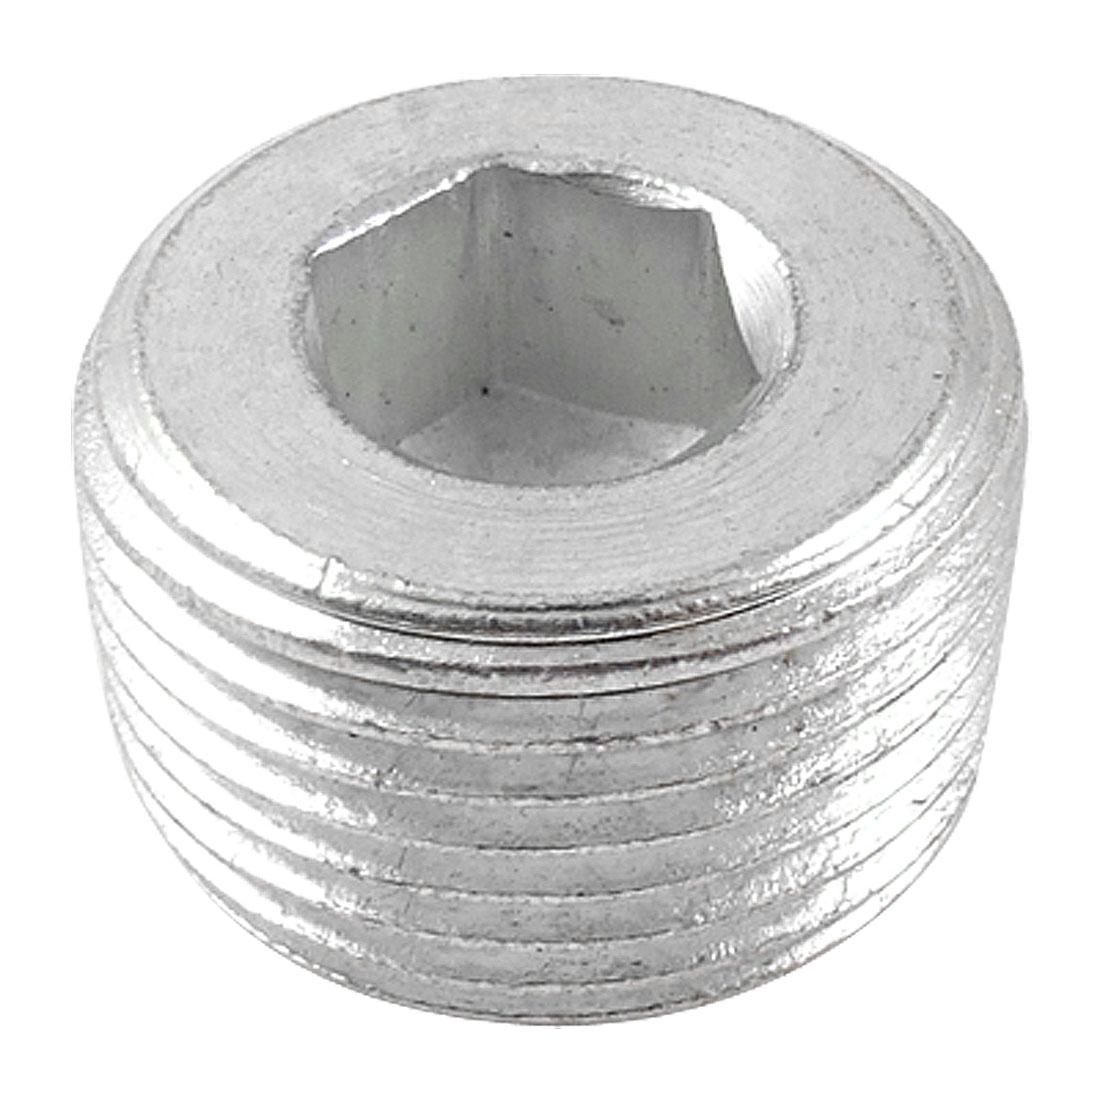 "Metal Internal Hex Head 1 1/3"" Thread Diameter Pipe Connector"